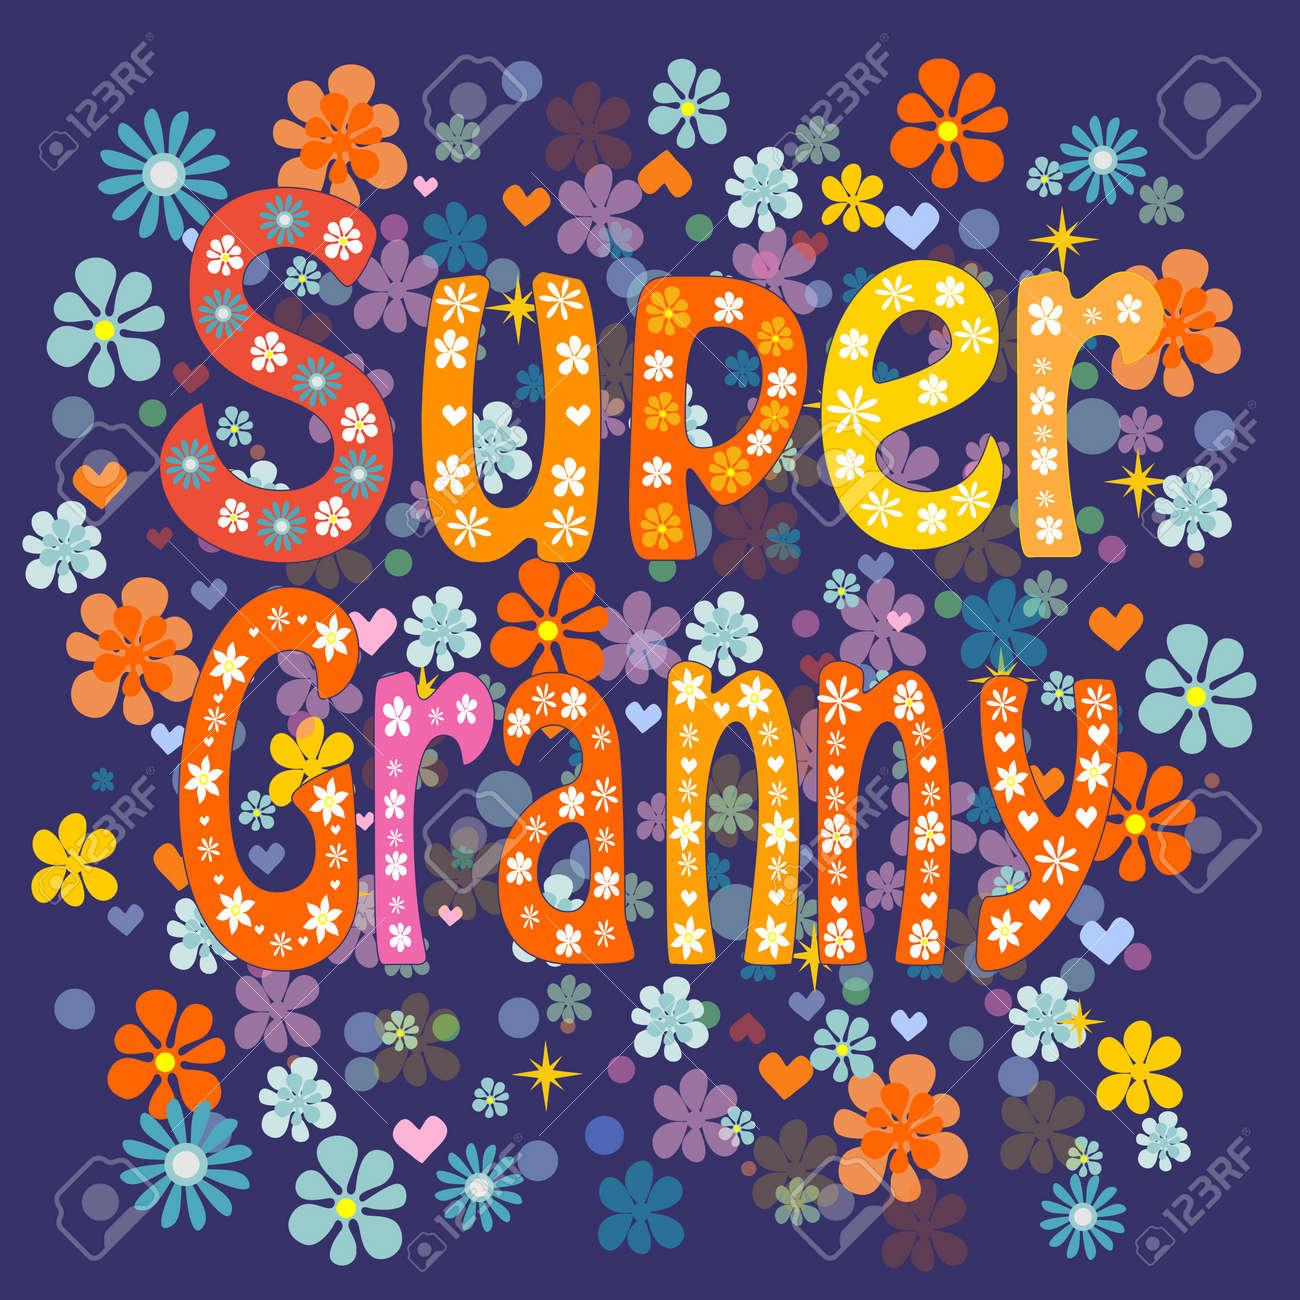 Super grandma cartoon old lady in an apron and a superhero cape - 49125169